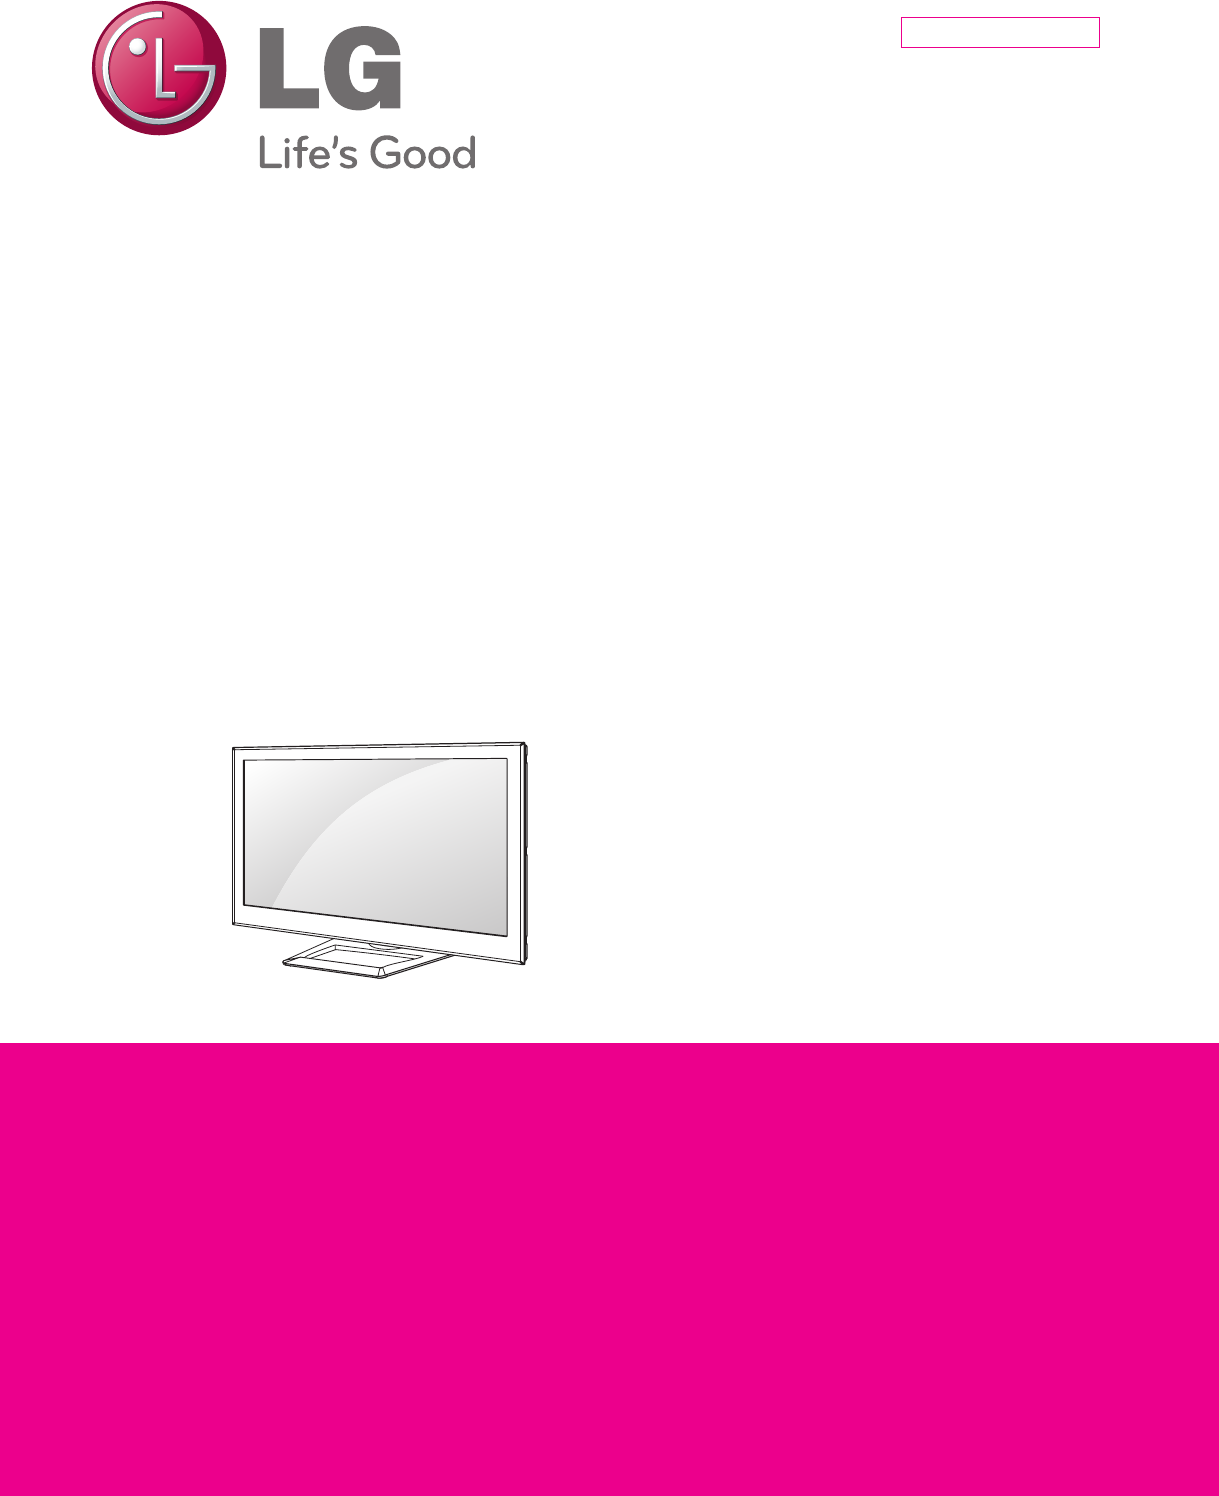 Lg 5610 Users Manual Ab Osd Wiring Diagram on